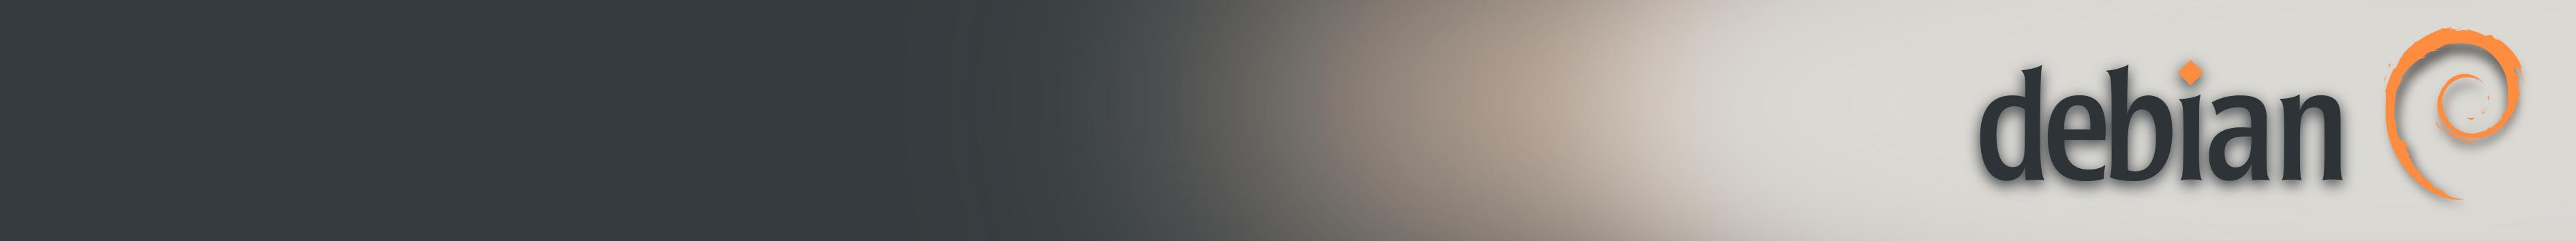 png/800x75-banner-installer.png